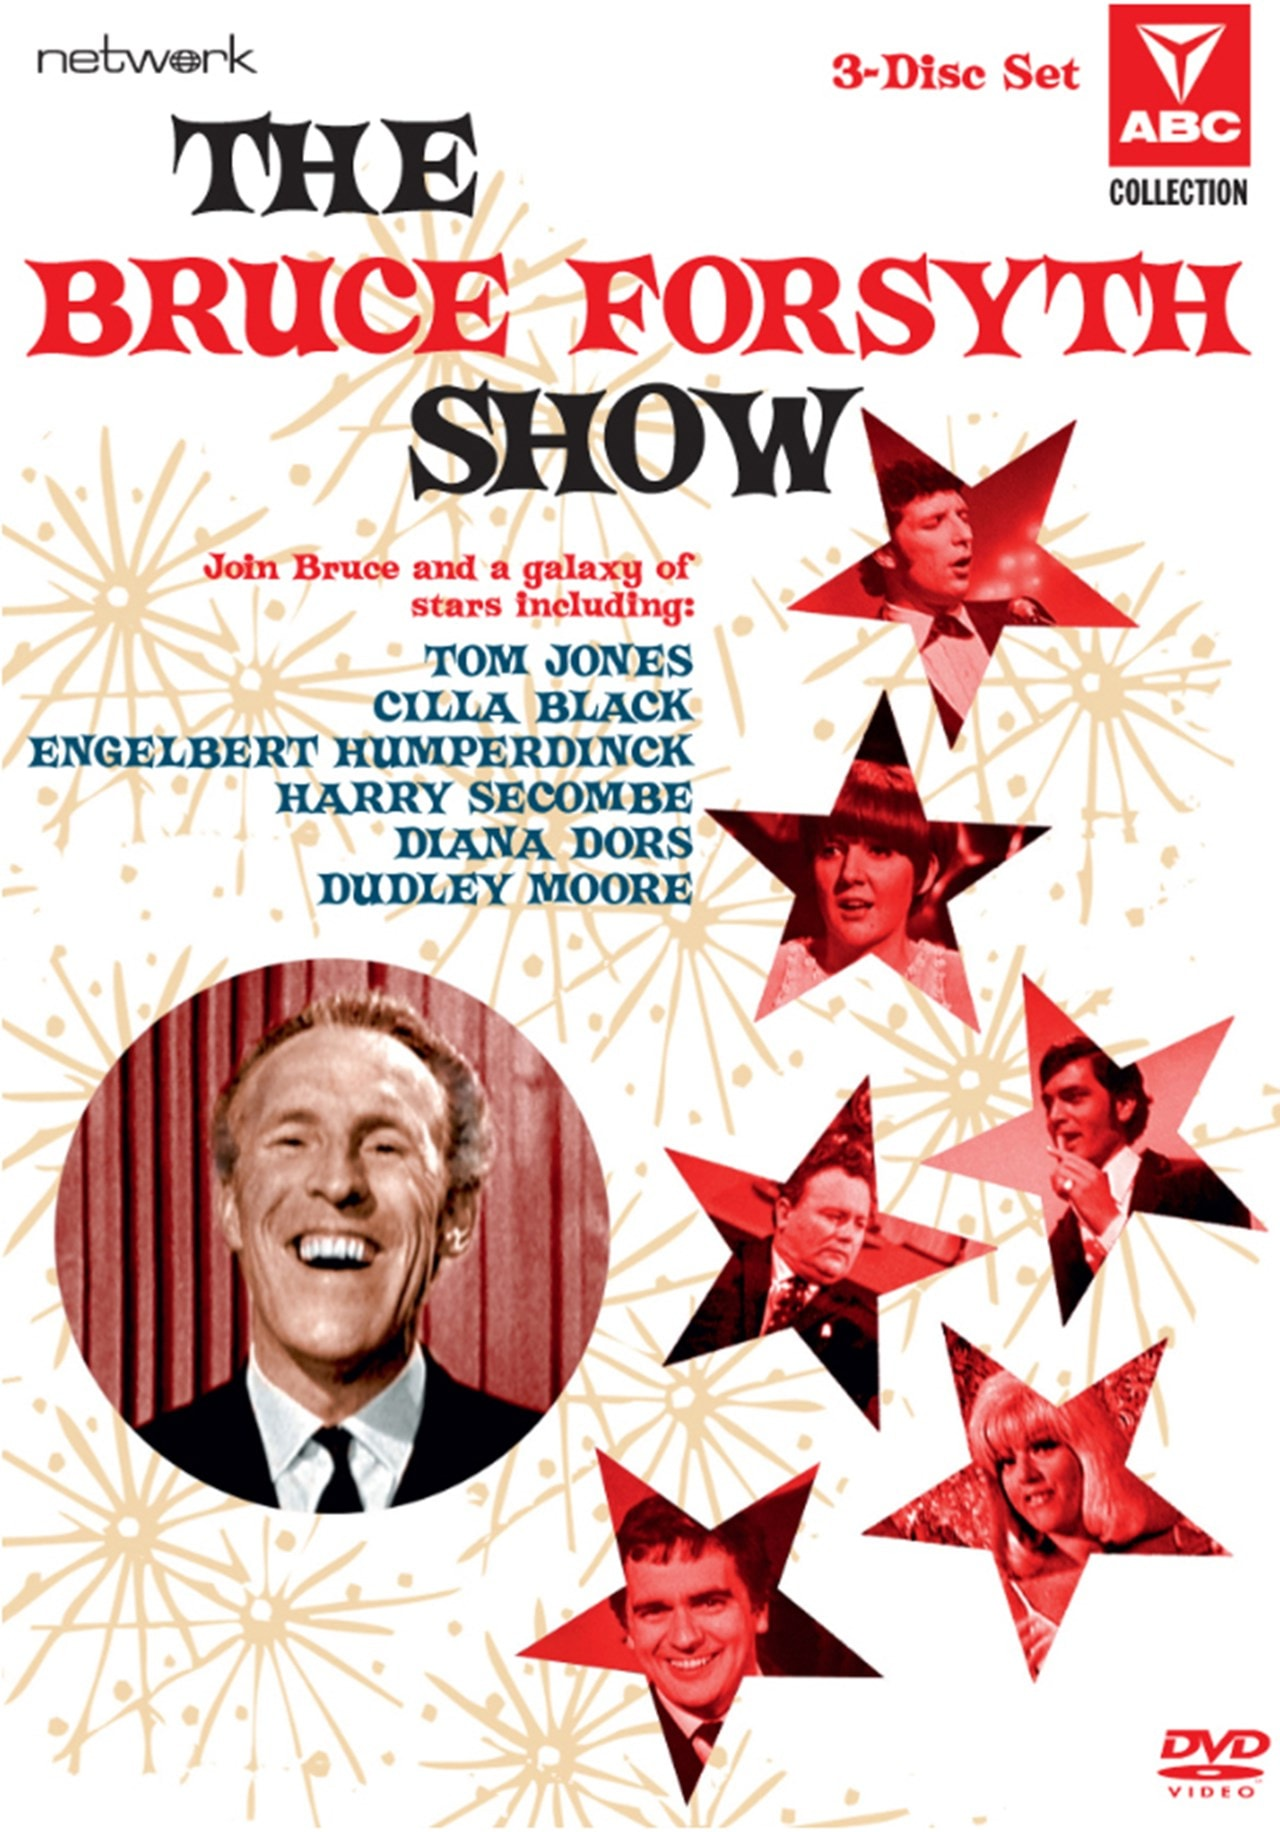 The Bruce Forsyth Show - 1